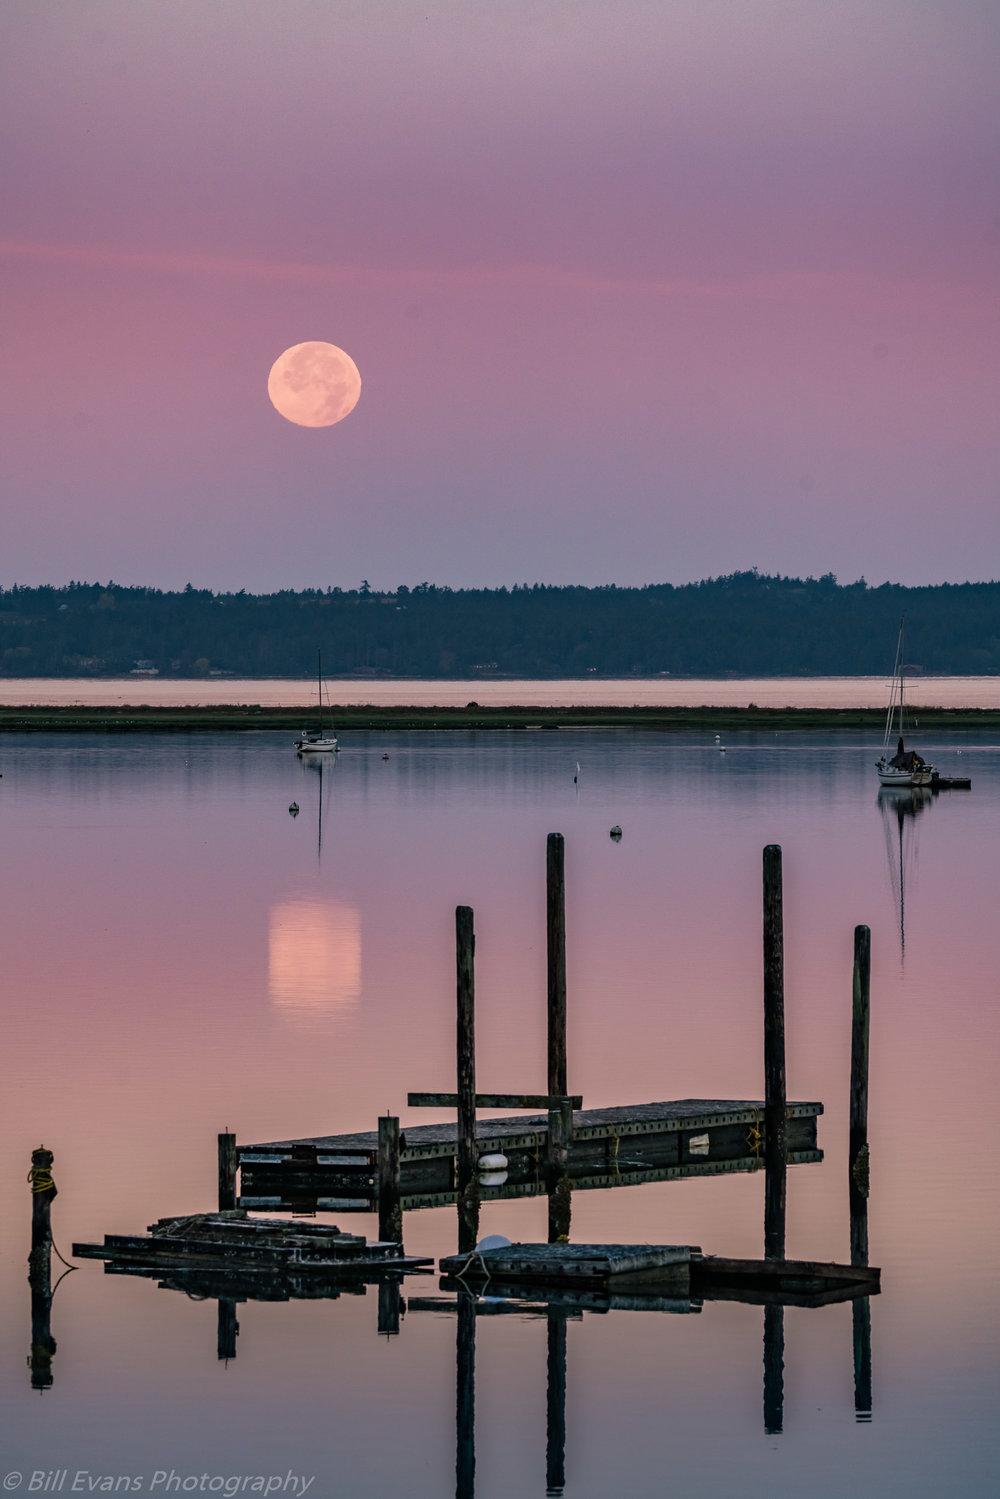 Image No. 2 - Full Moon Setting over Fisherman Bay (Lopez Island, Washington)   Sony A7Rii + Sigma 150-600mm (1/200s @ f/8 iso 800)